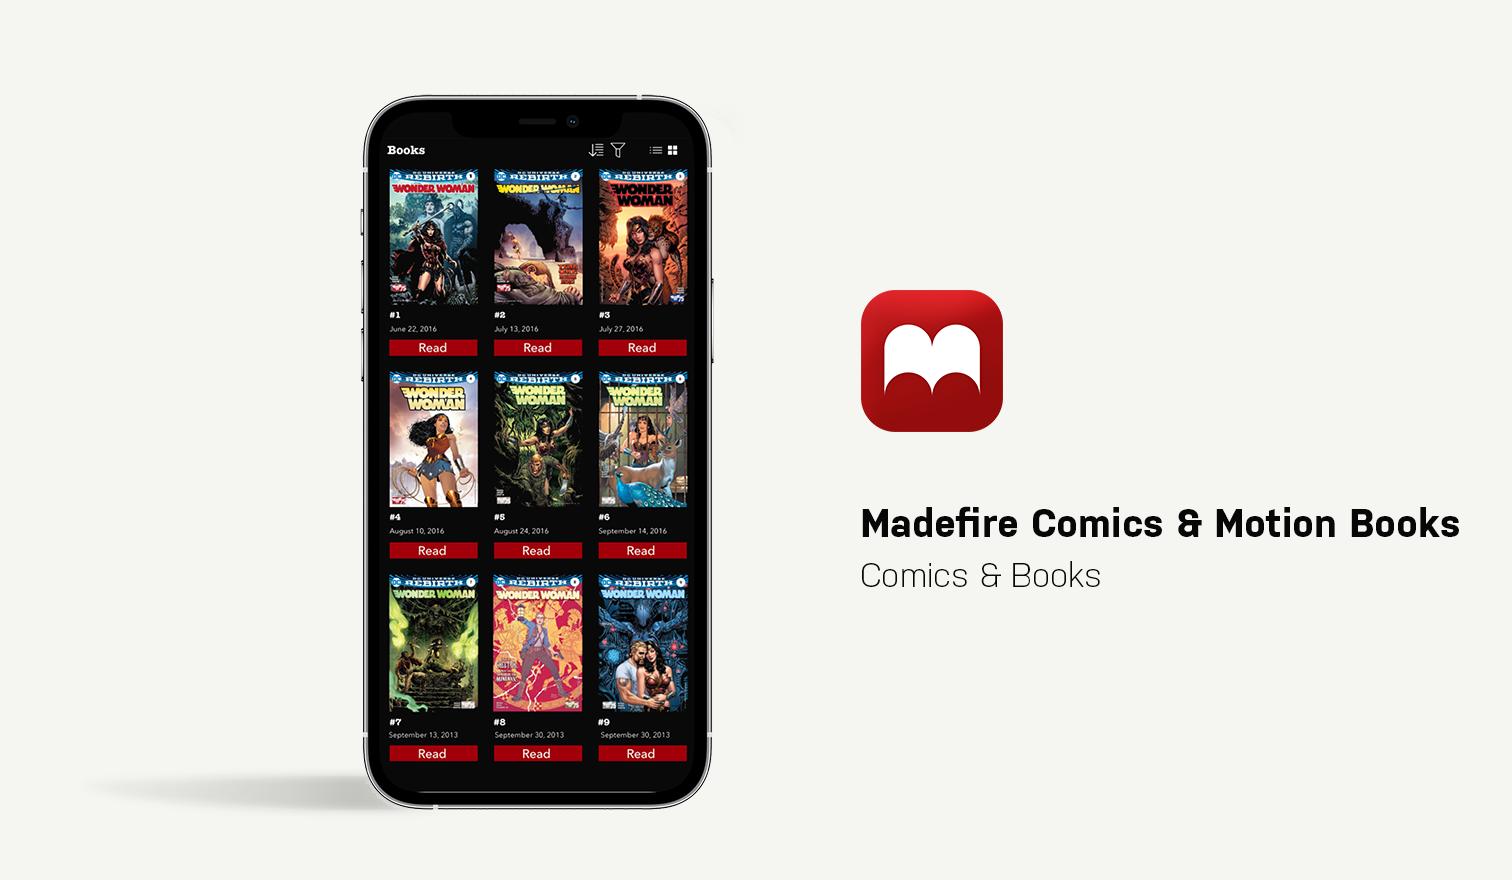 madfire comics app